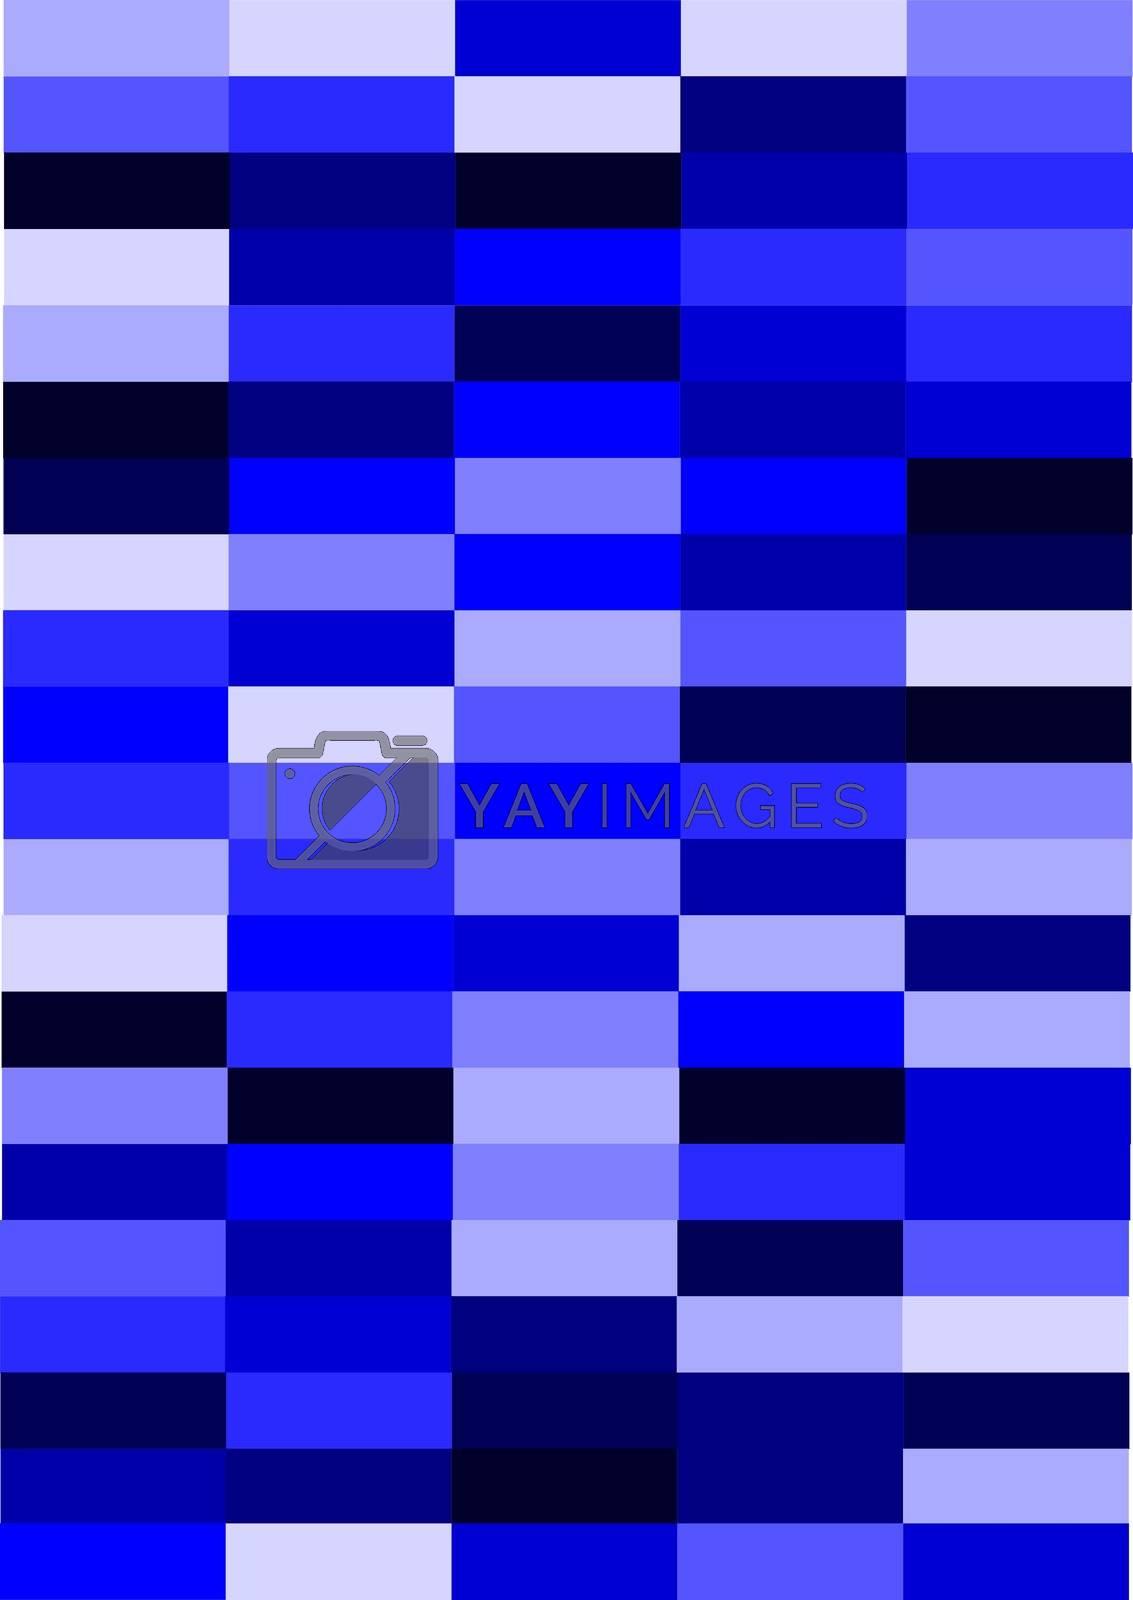 Royalty free image of Blue Block Background by jasony00